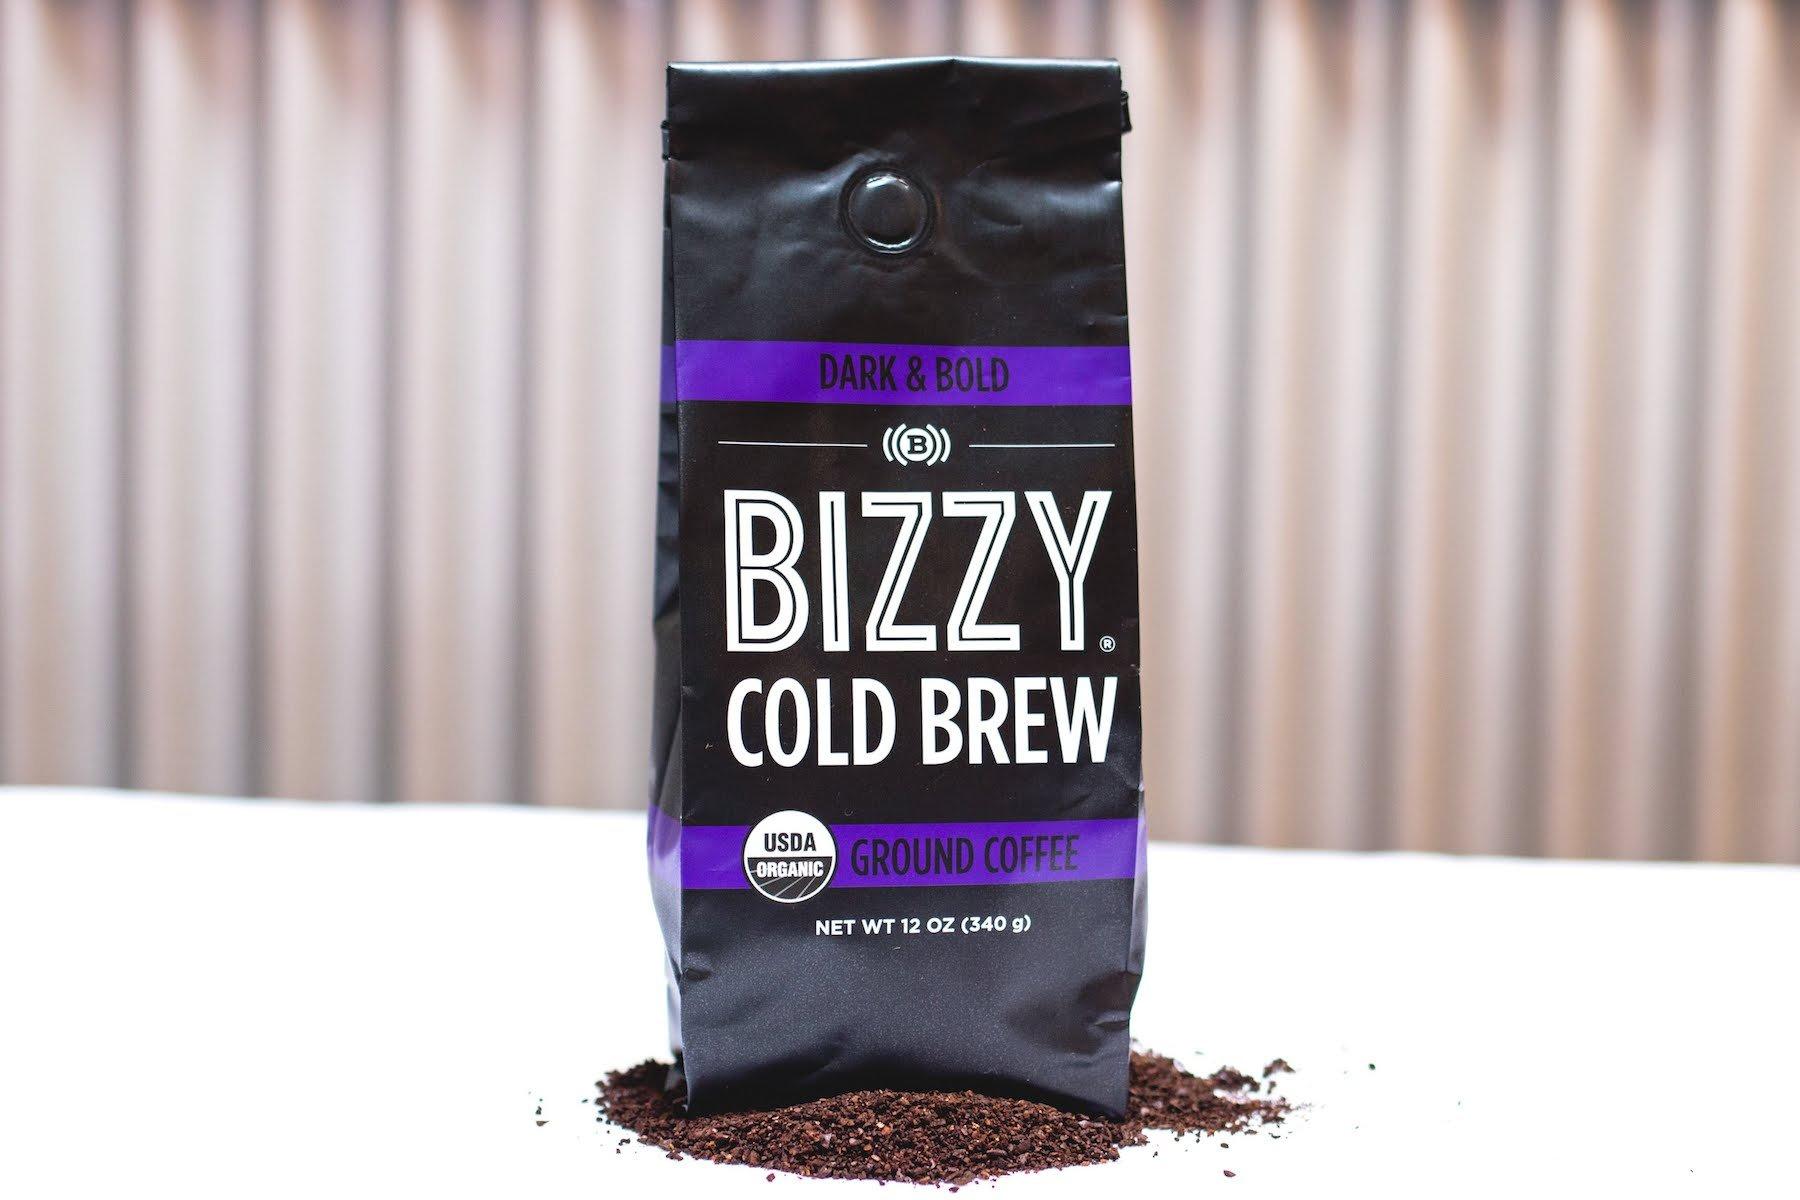 Bizzy Organic Cold Brew Coffee - Dark & Bold Blend - Coarse Ground Coffee - 12 oz by Bizzy (Image #6)